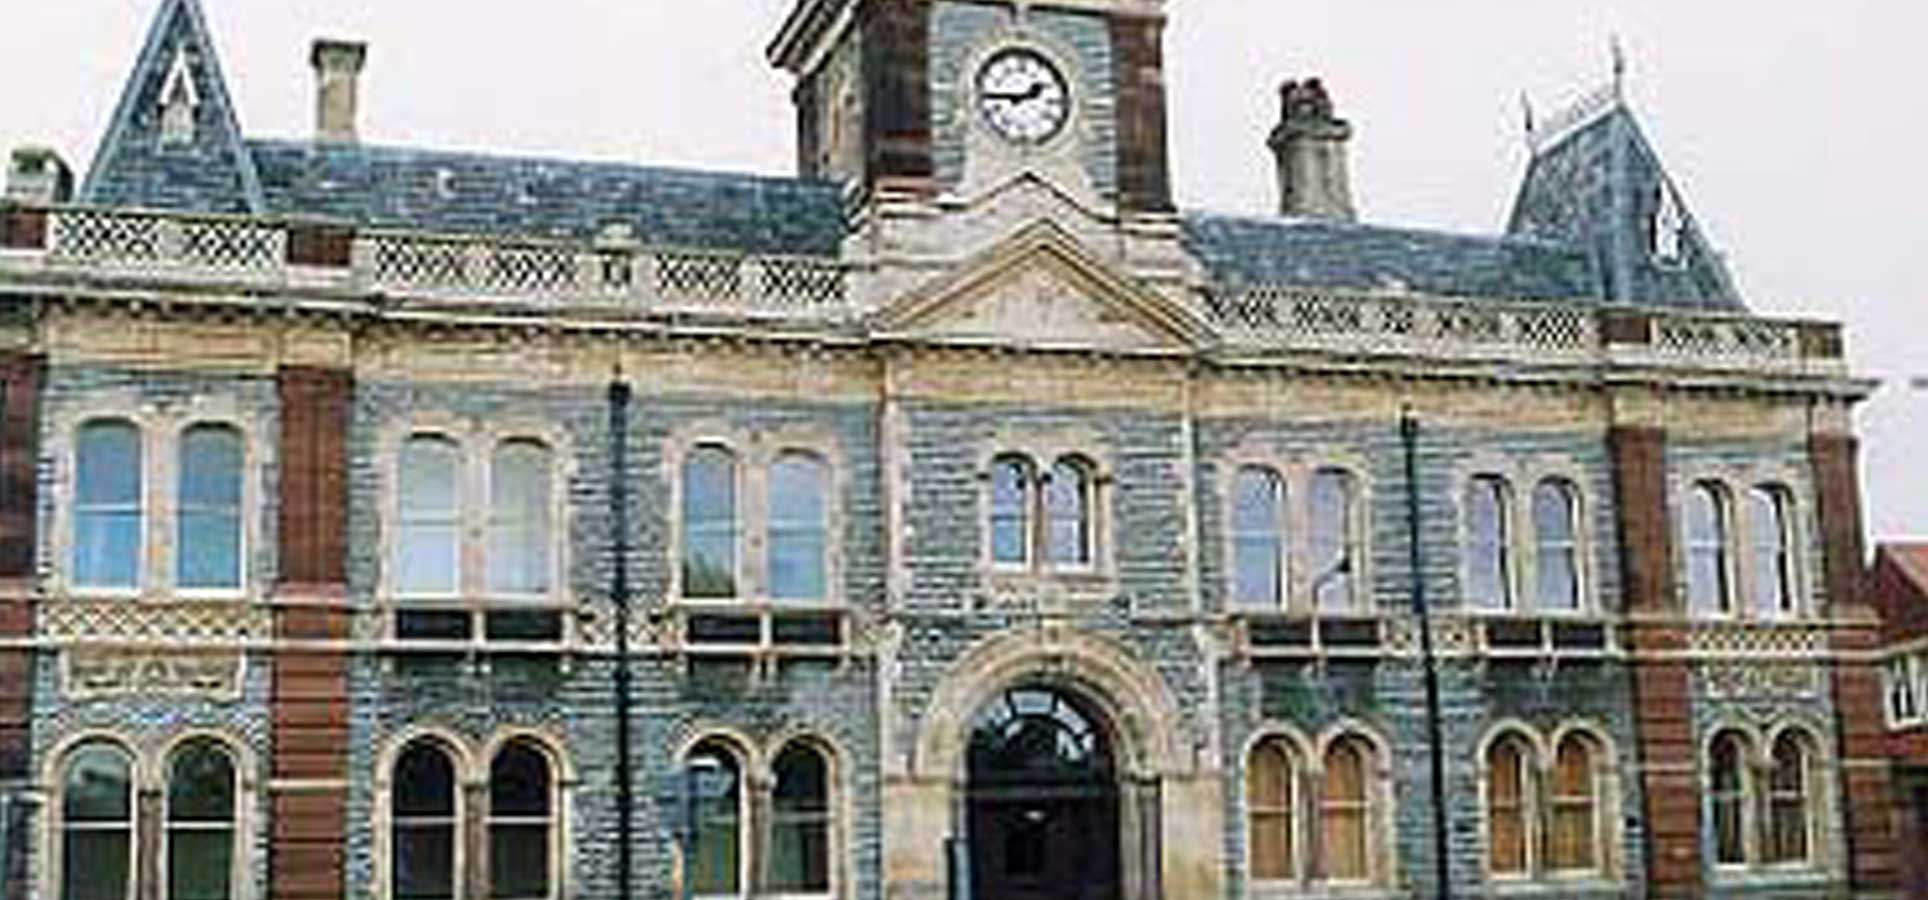 Castle Brewery, Newark, Jessops Construction Ltd